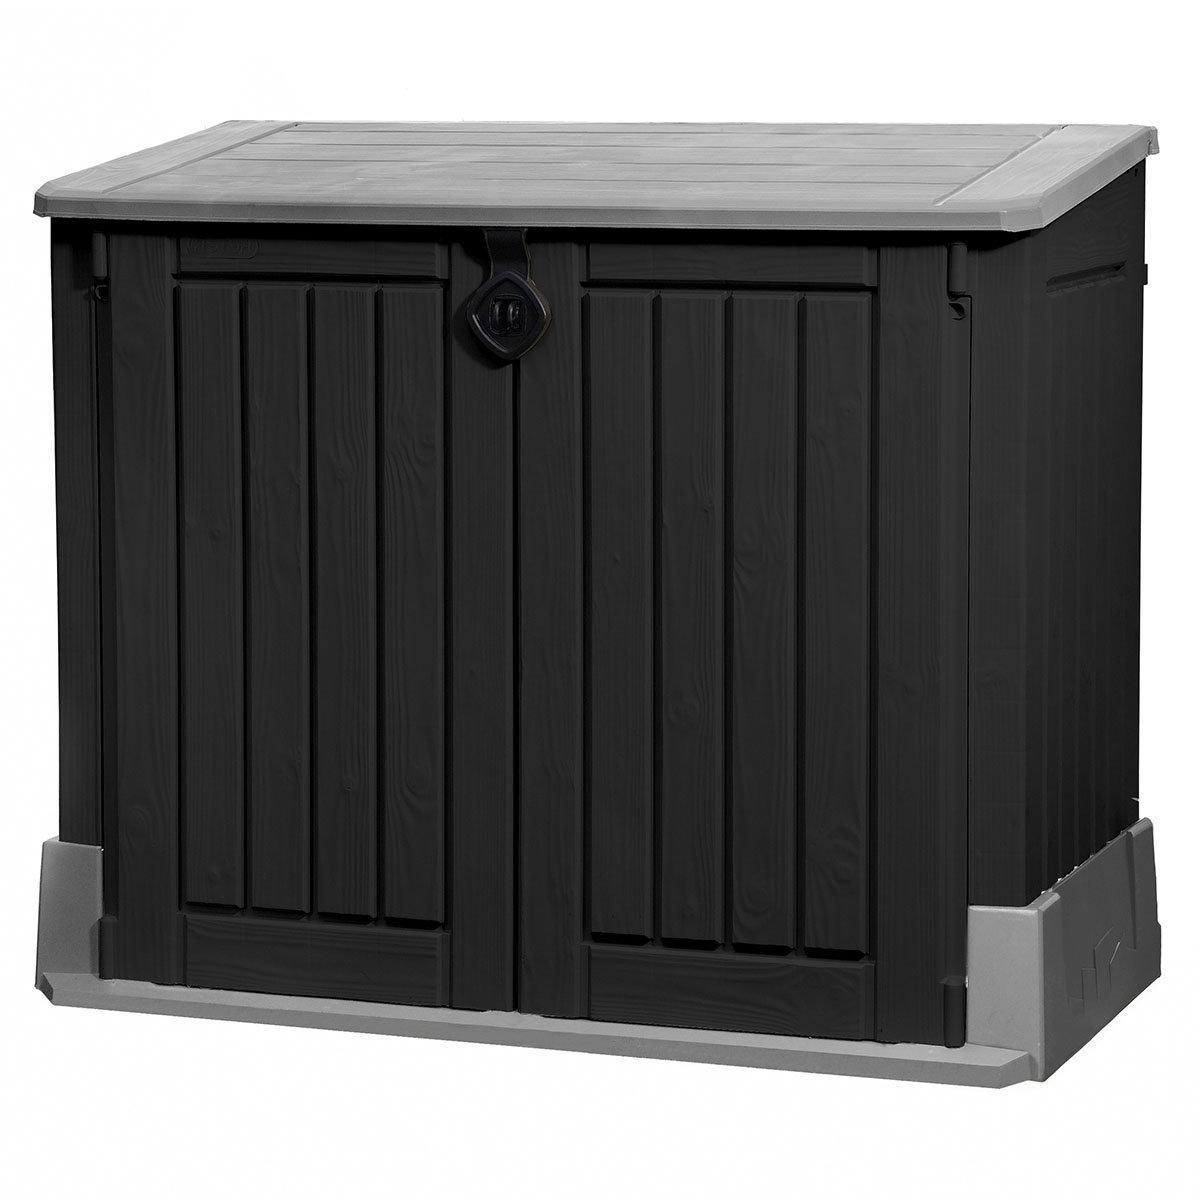 Store It Out Midi Aufbewahrungsbox Woodland 845 L, schwarz/grau